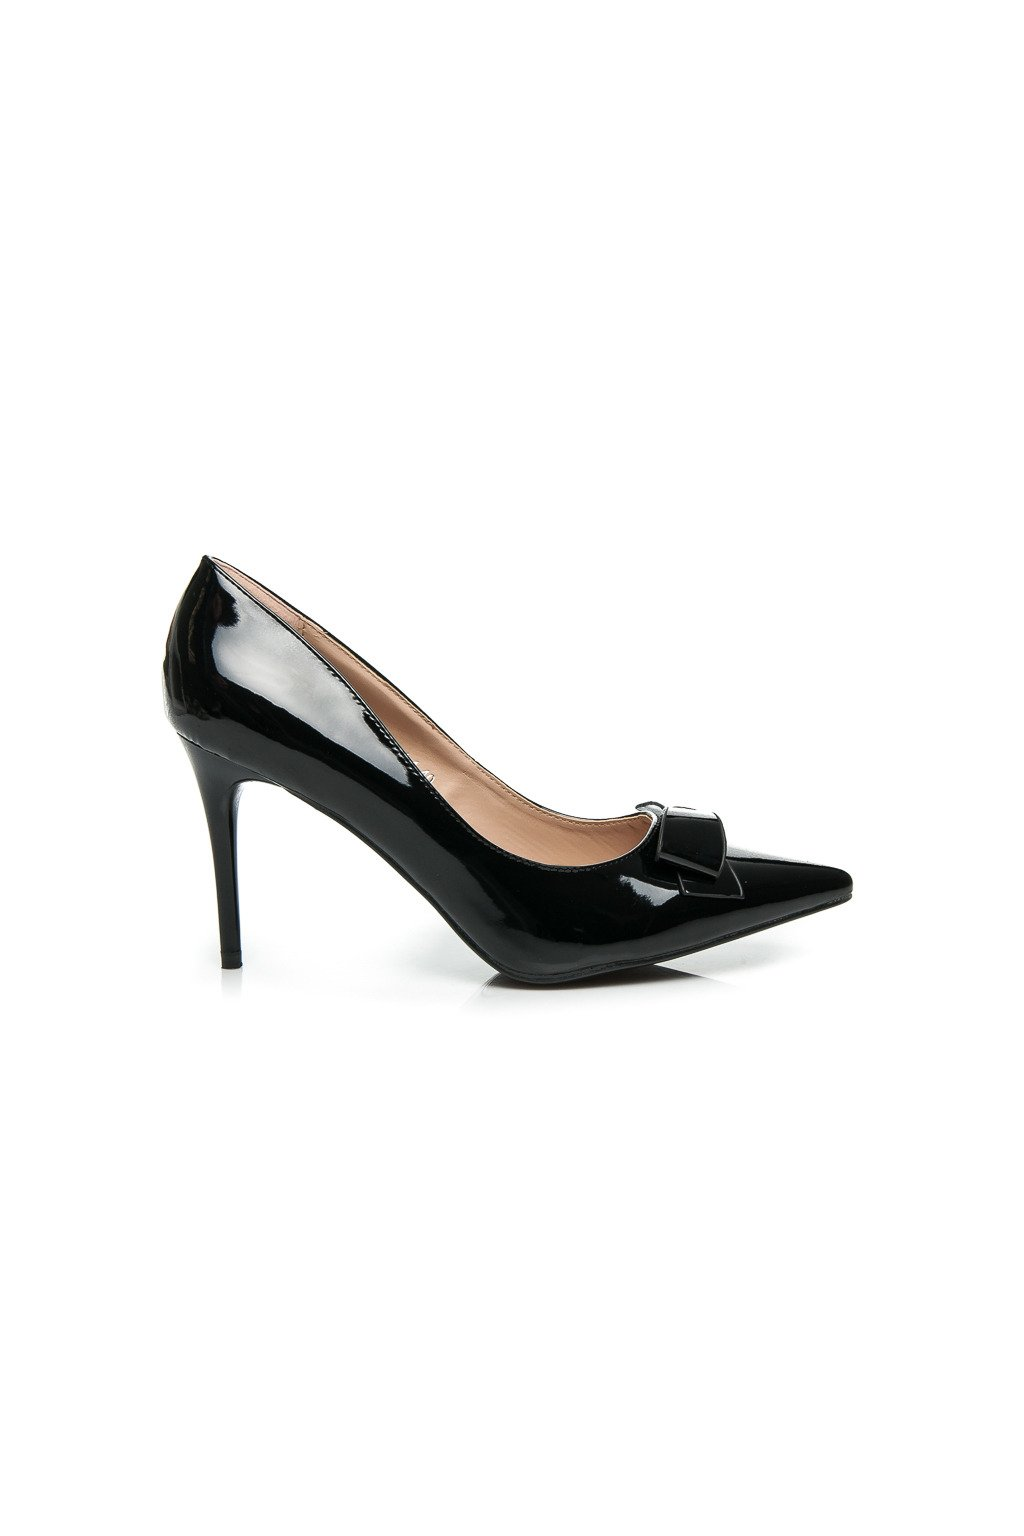 e47f3d2ca130 Damska obuv prada